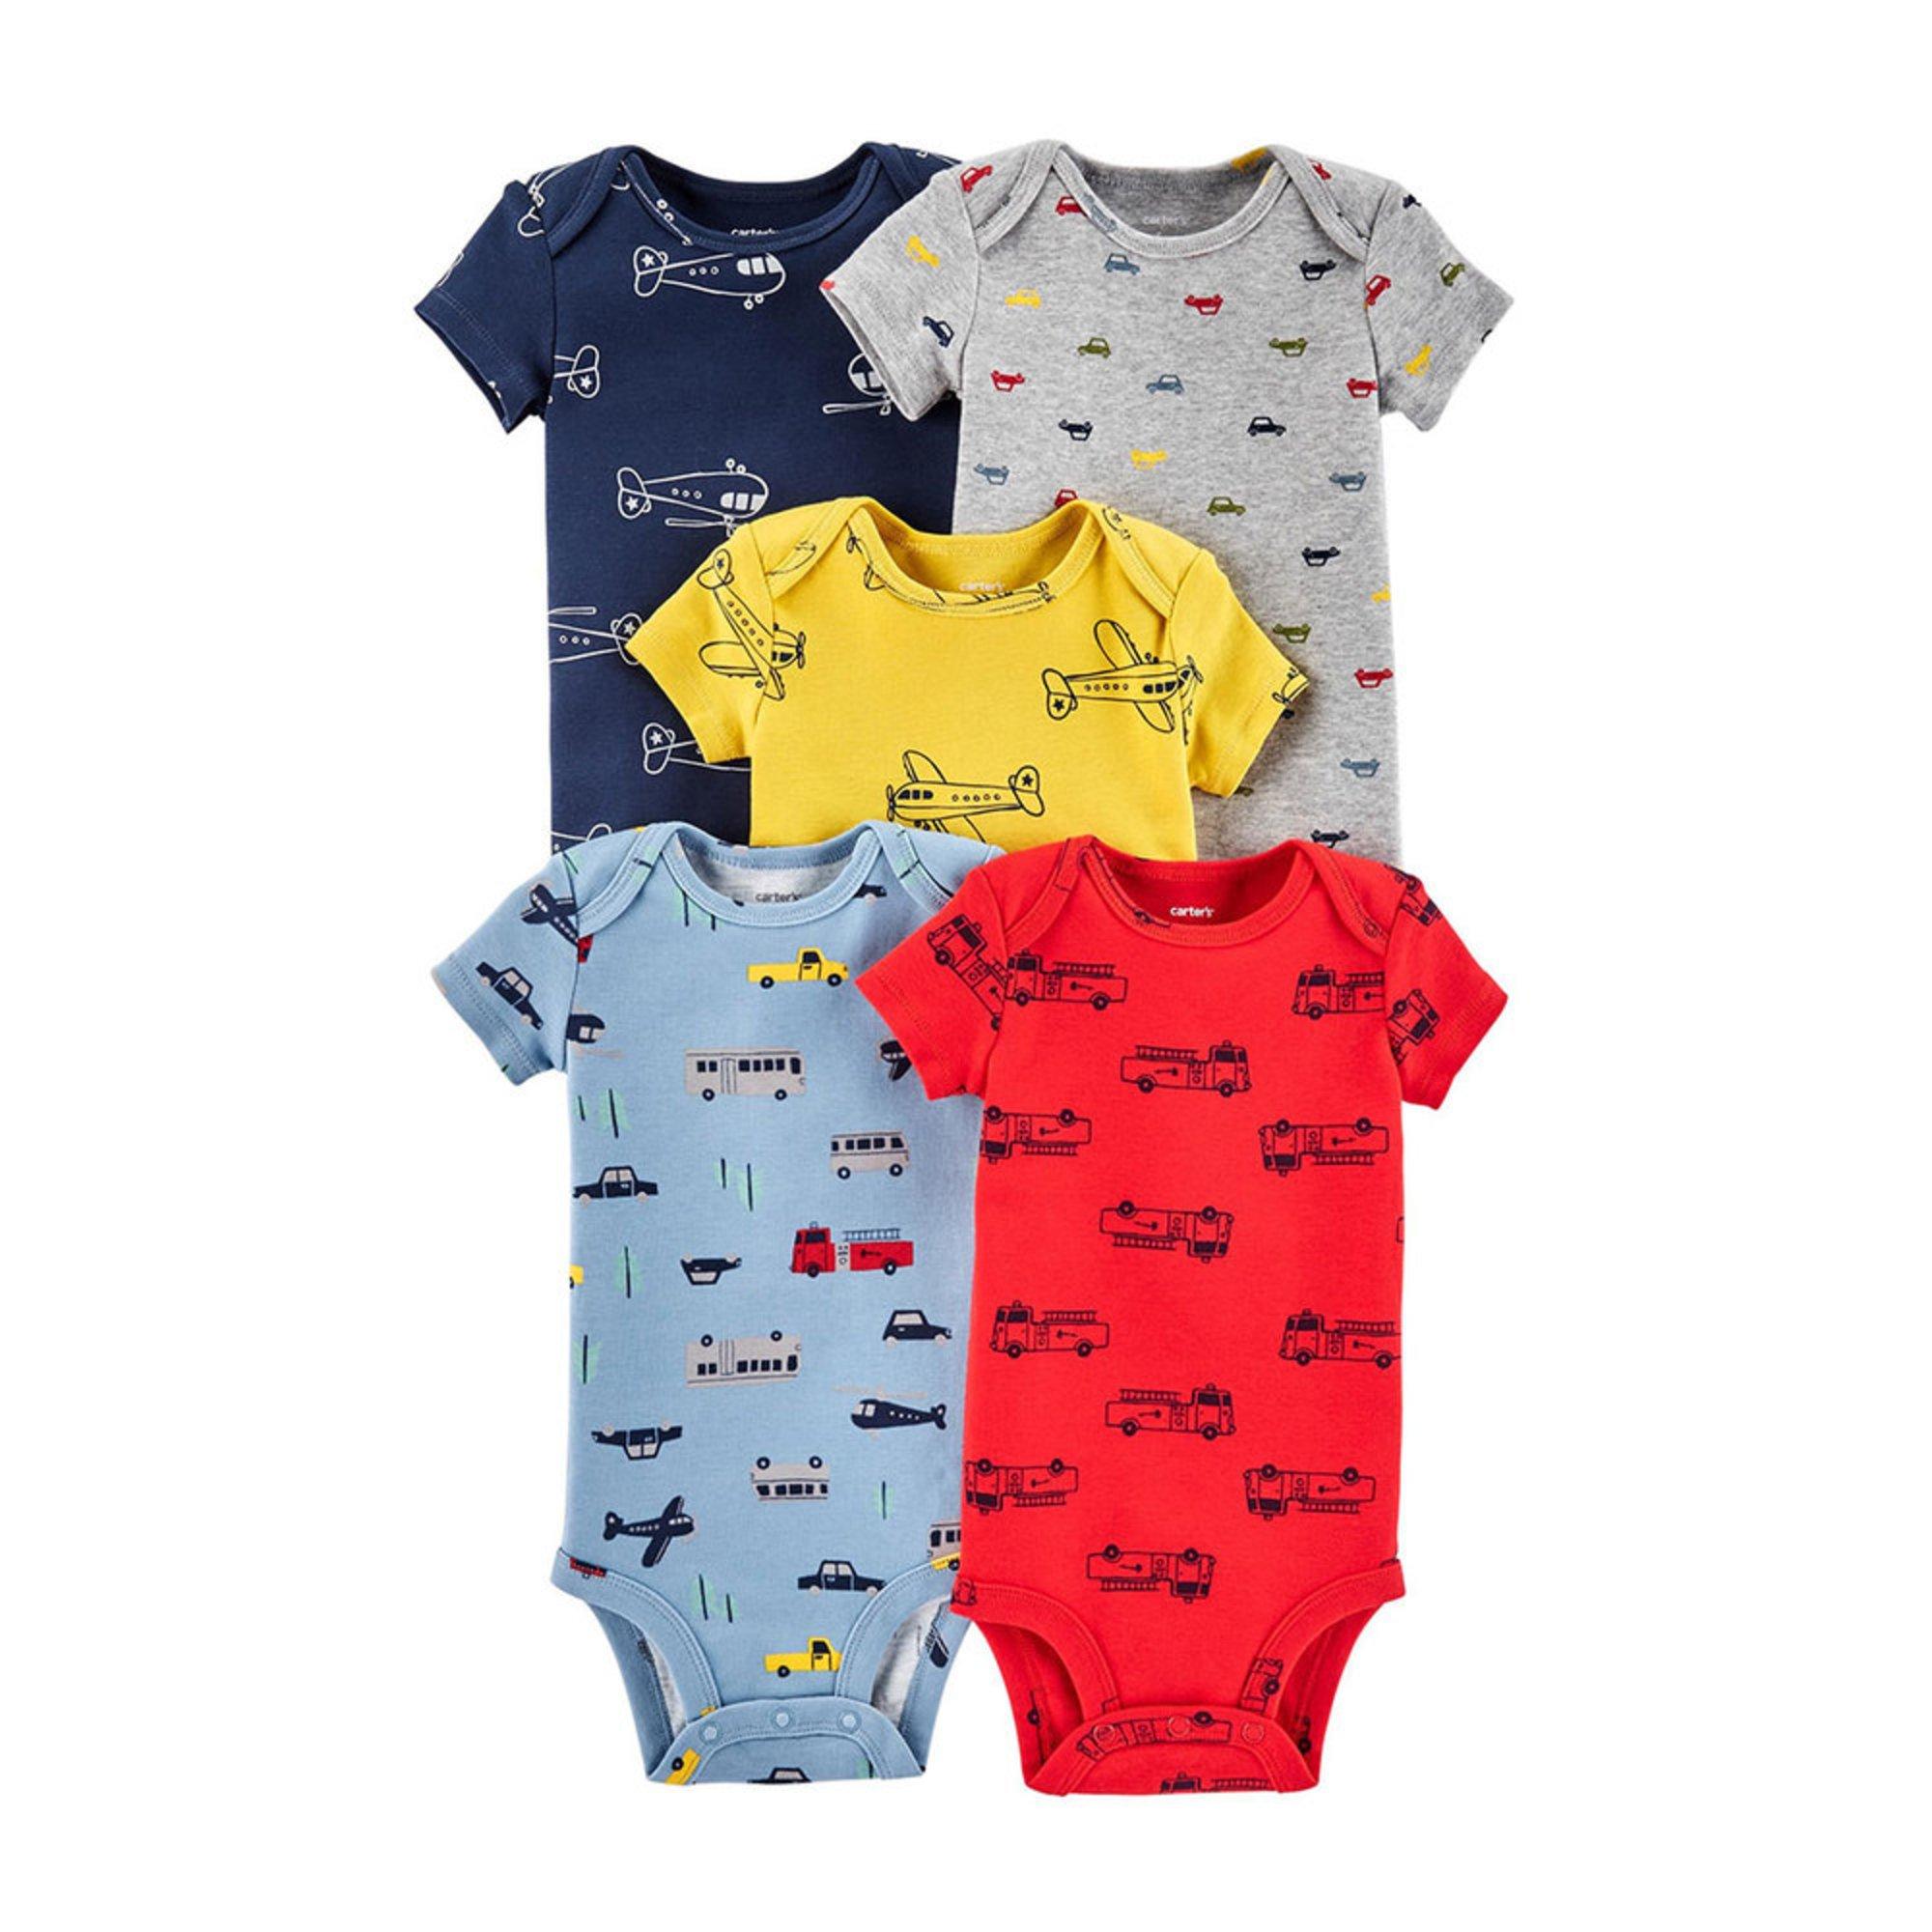 aa3170a52 Carter's Baby Boys' 5-pack Short Sleeve Bodysuit Set | Baby Boys ...